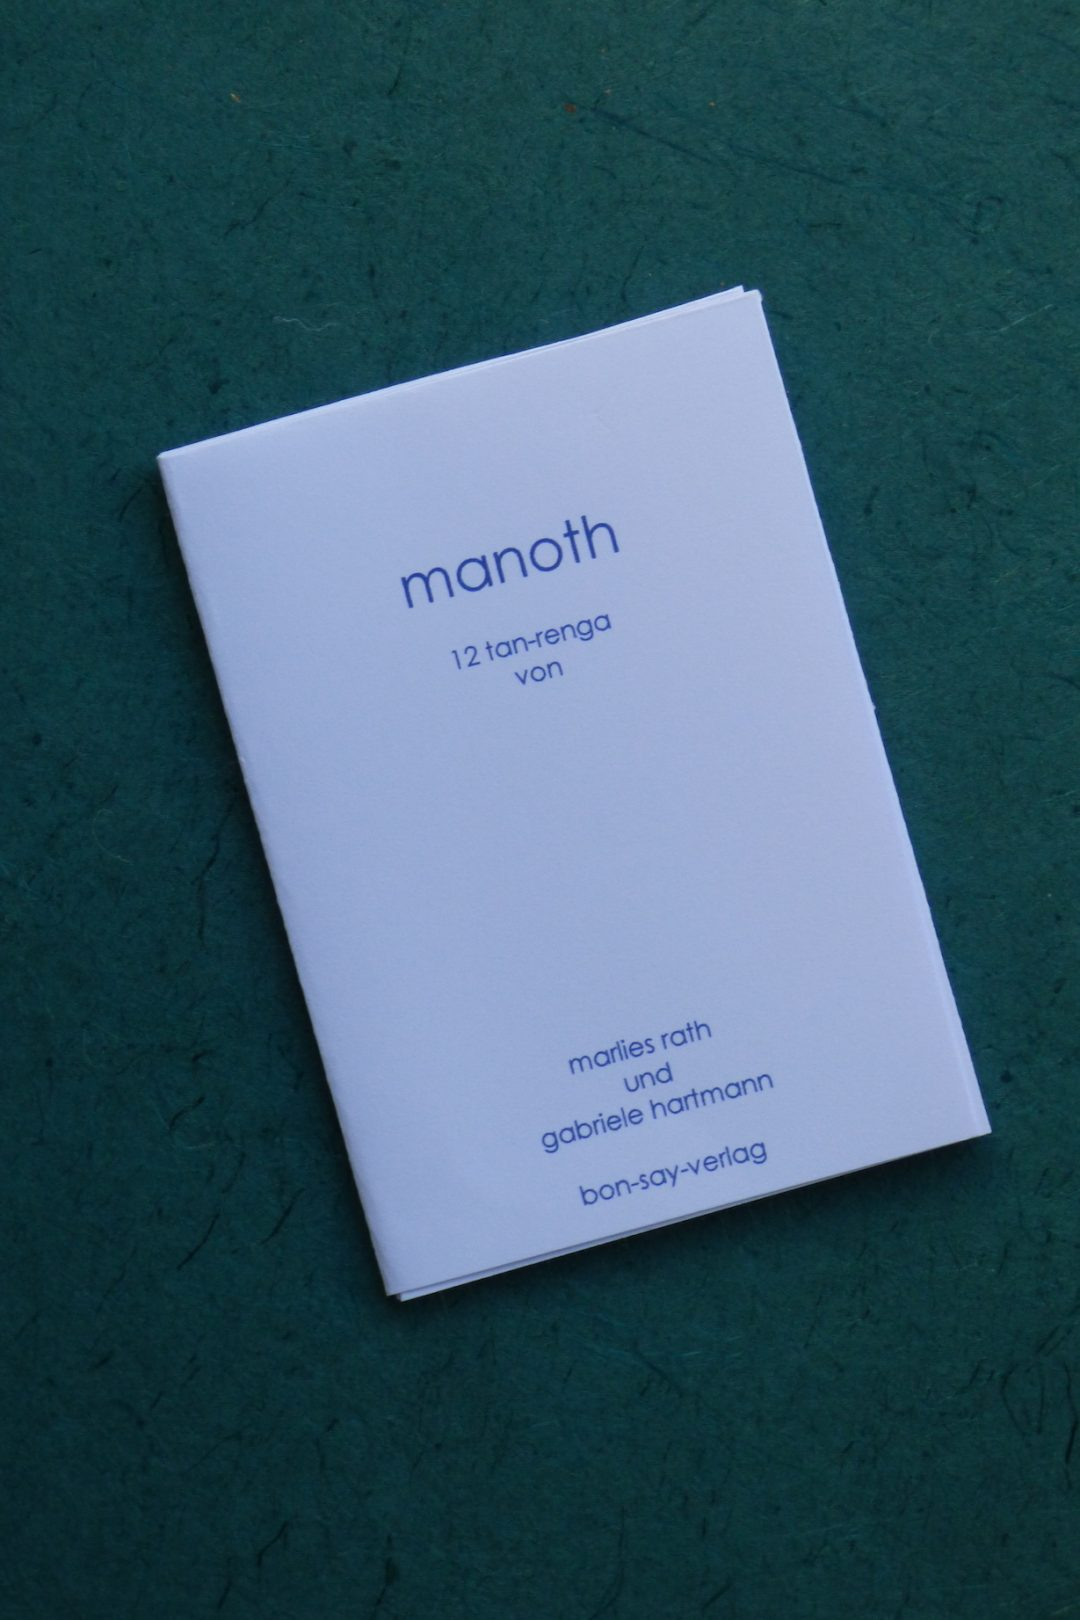 manoth